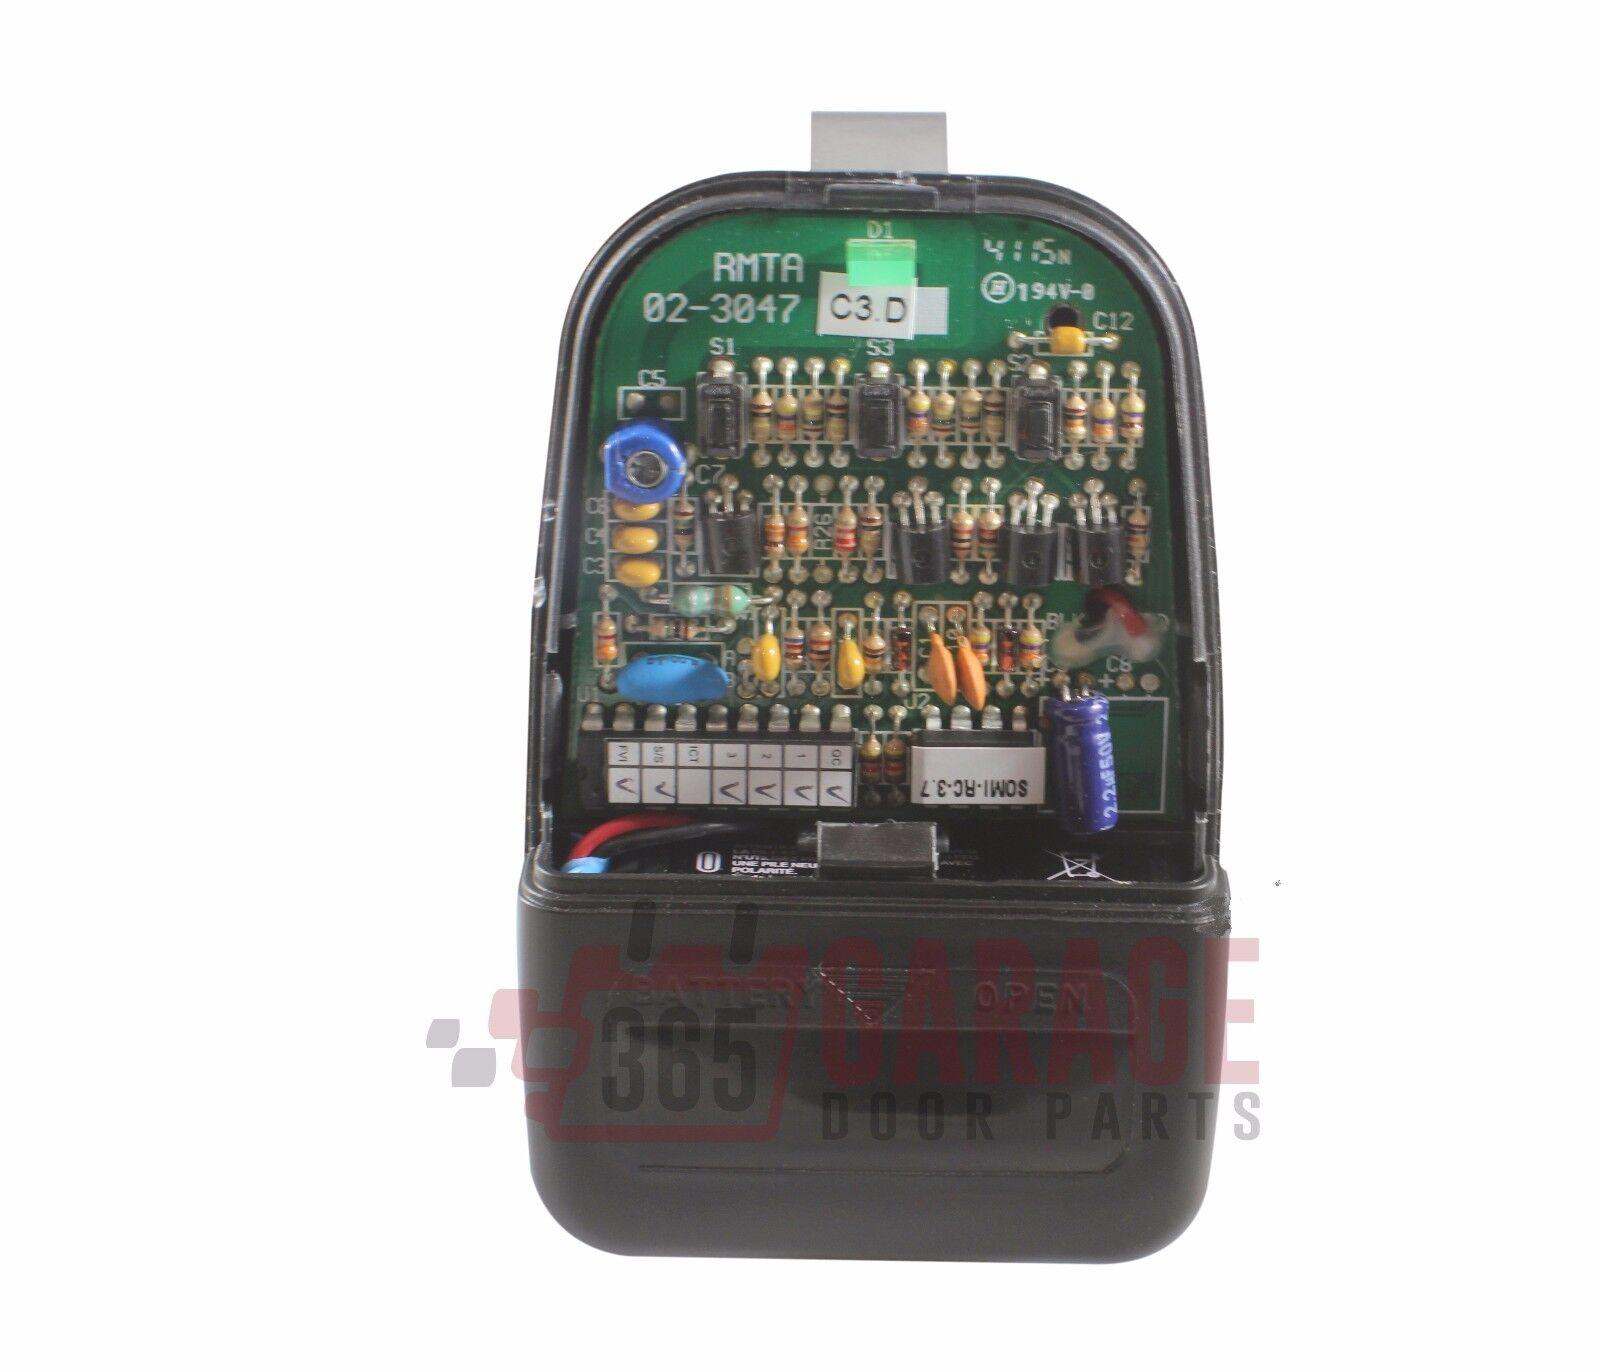 Wayne Dalton 309884 3910 3 Button Visor Remote Control 303